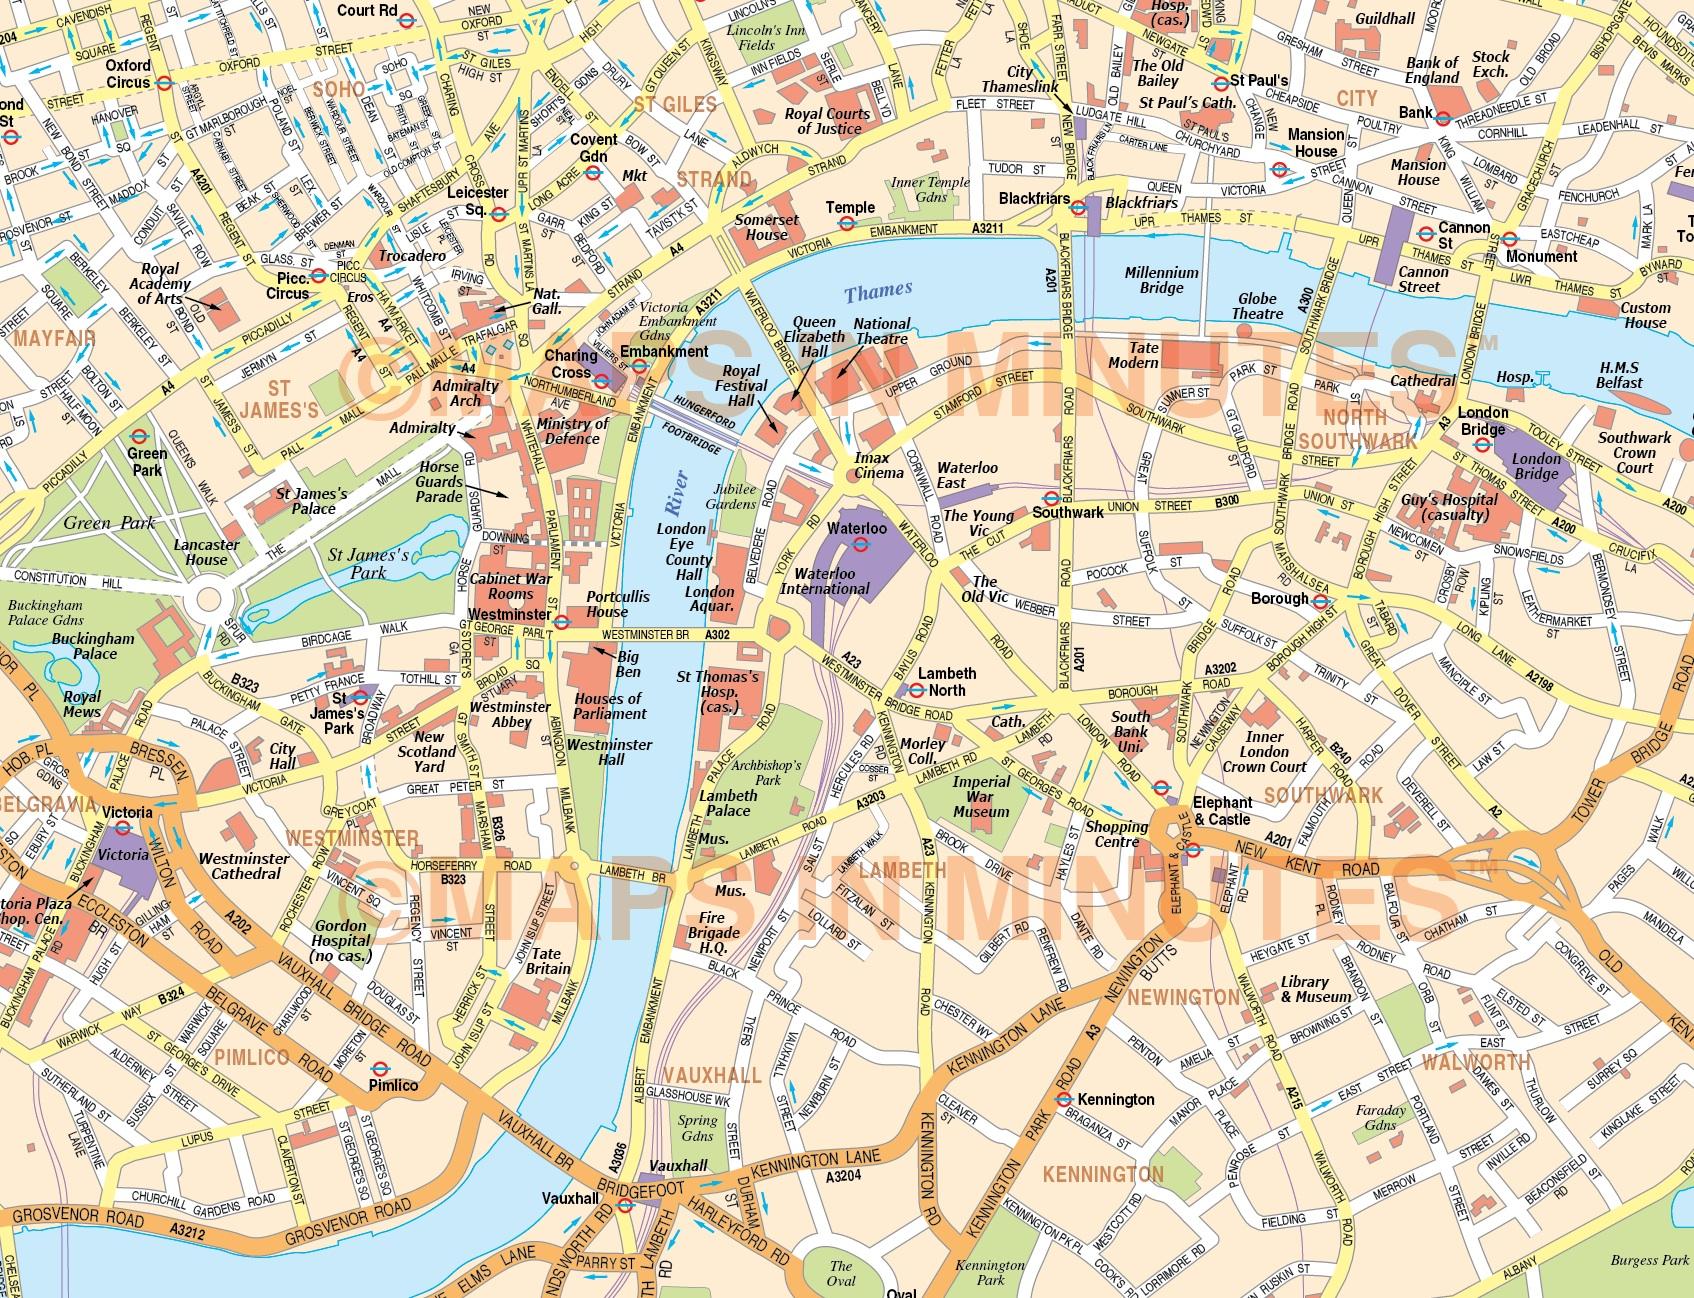 Download Map London.Top 10 Punto Medio Noticias London City Map Free Download